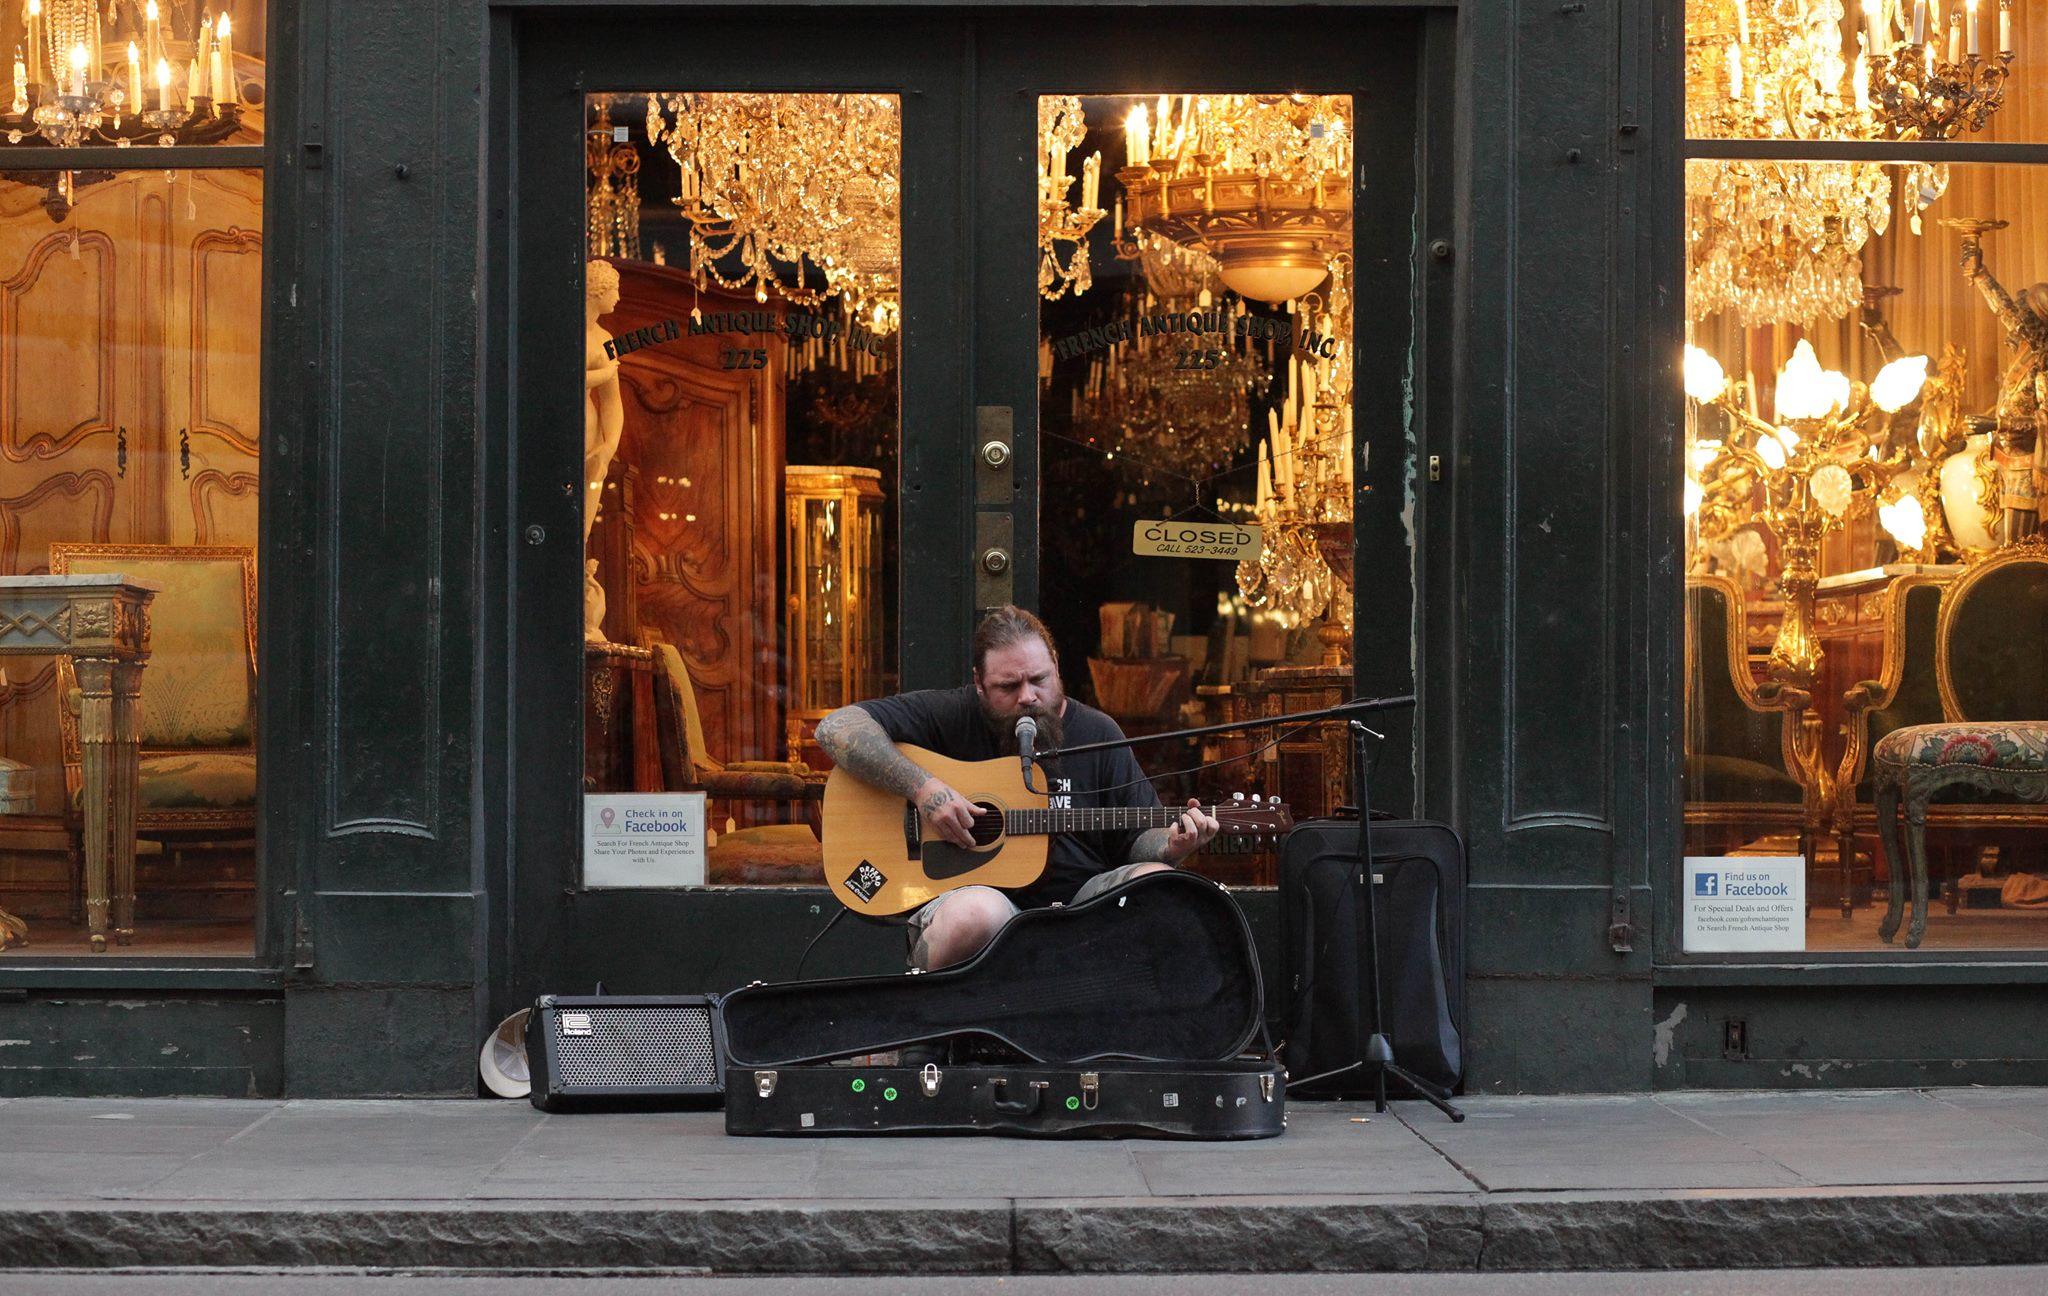 A beautiful voice outside Hotel Monteleone